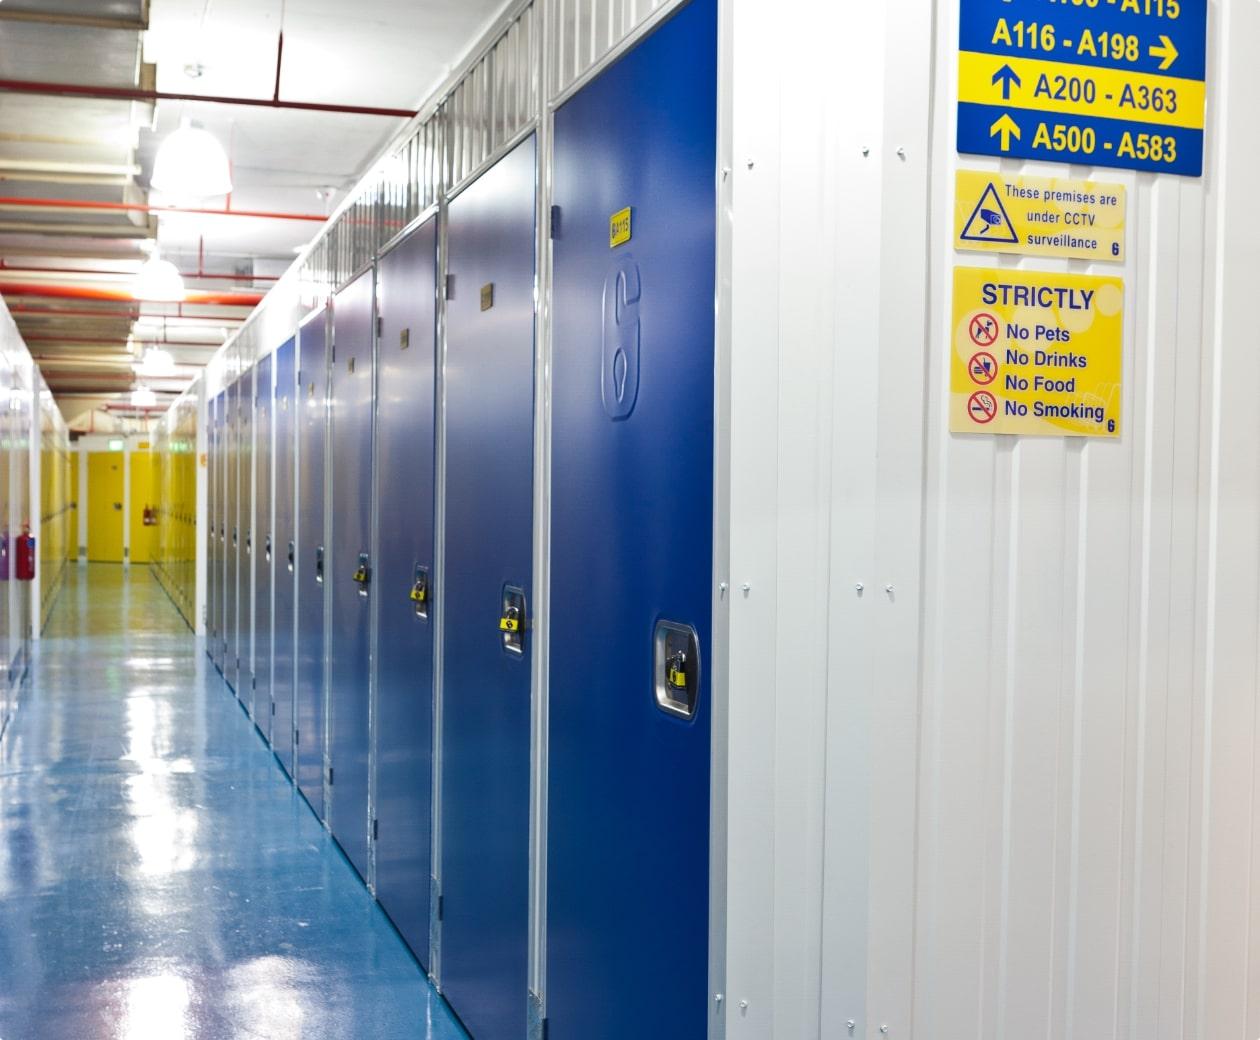 Storefriendly storage units